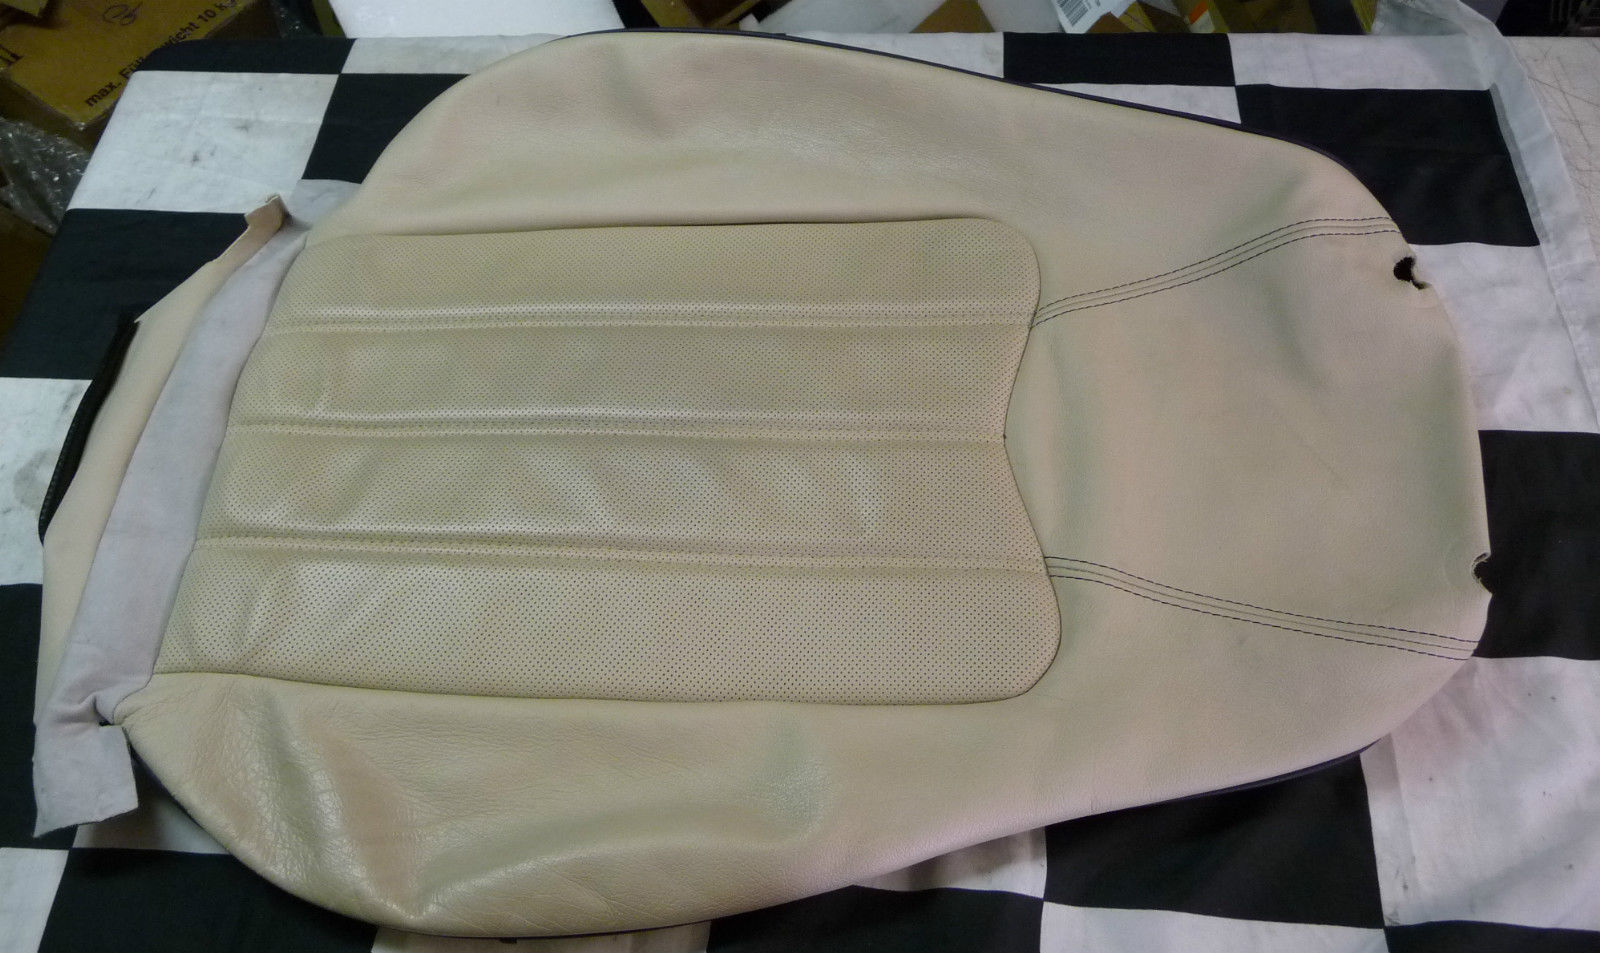 2010 Maserati Quattroporte Front Seat Back Padding 964793232 - Used Auto Parts Store | LA Global Parts